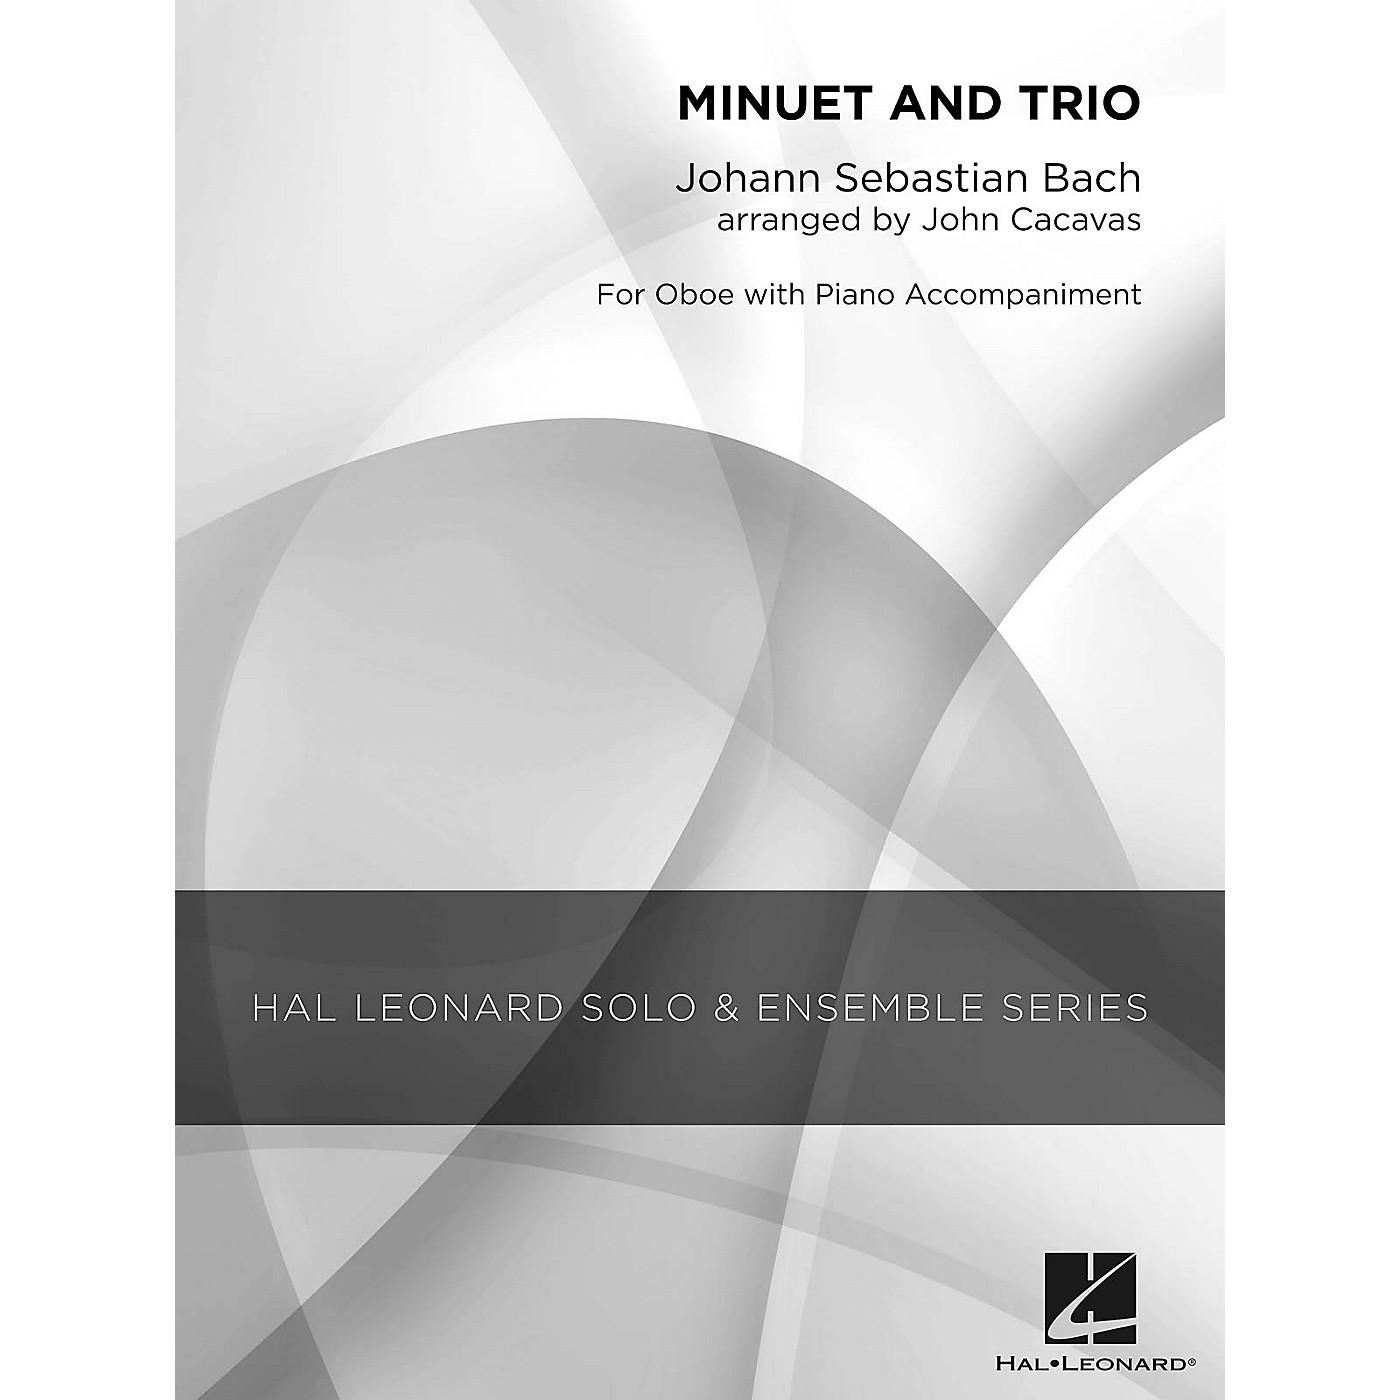 Hal Leonard Minuet and Trio (Grade 2.5 Oboe Solo) Concert Band Level 2.5 Arranged by John Cacavas thumbnail